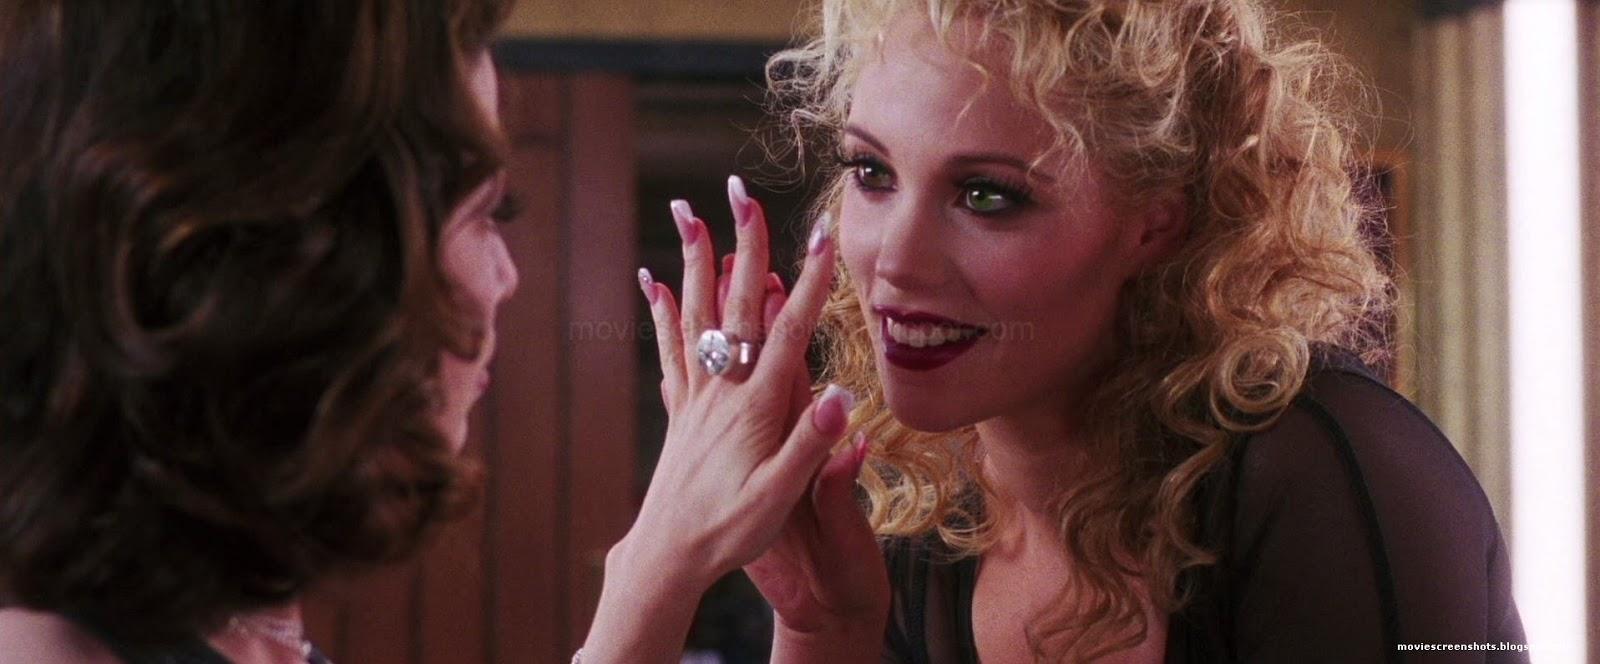 Showgirls (1995) Download YIFY Movie Torrent - YTS